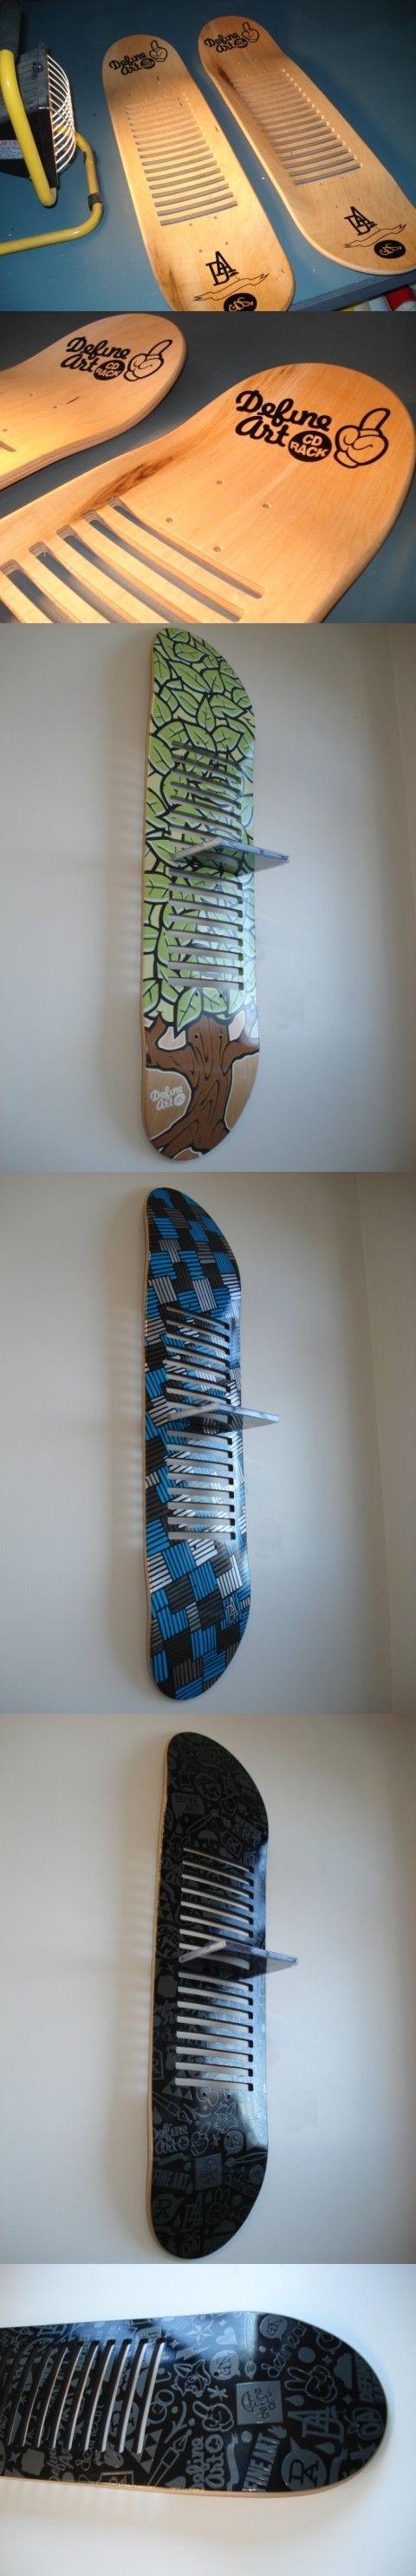 DefineArt CD racks (skateboards) by Glenn Smith, via Behance: